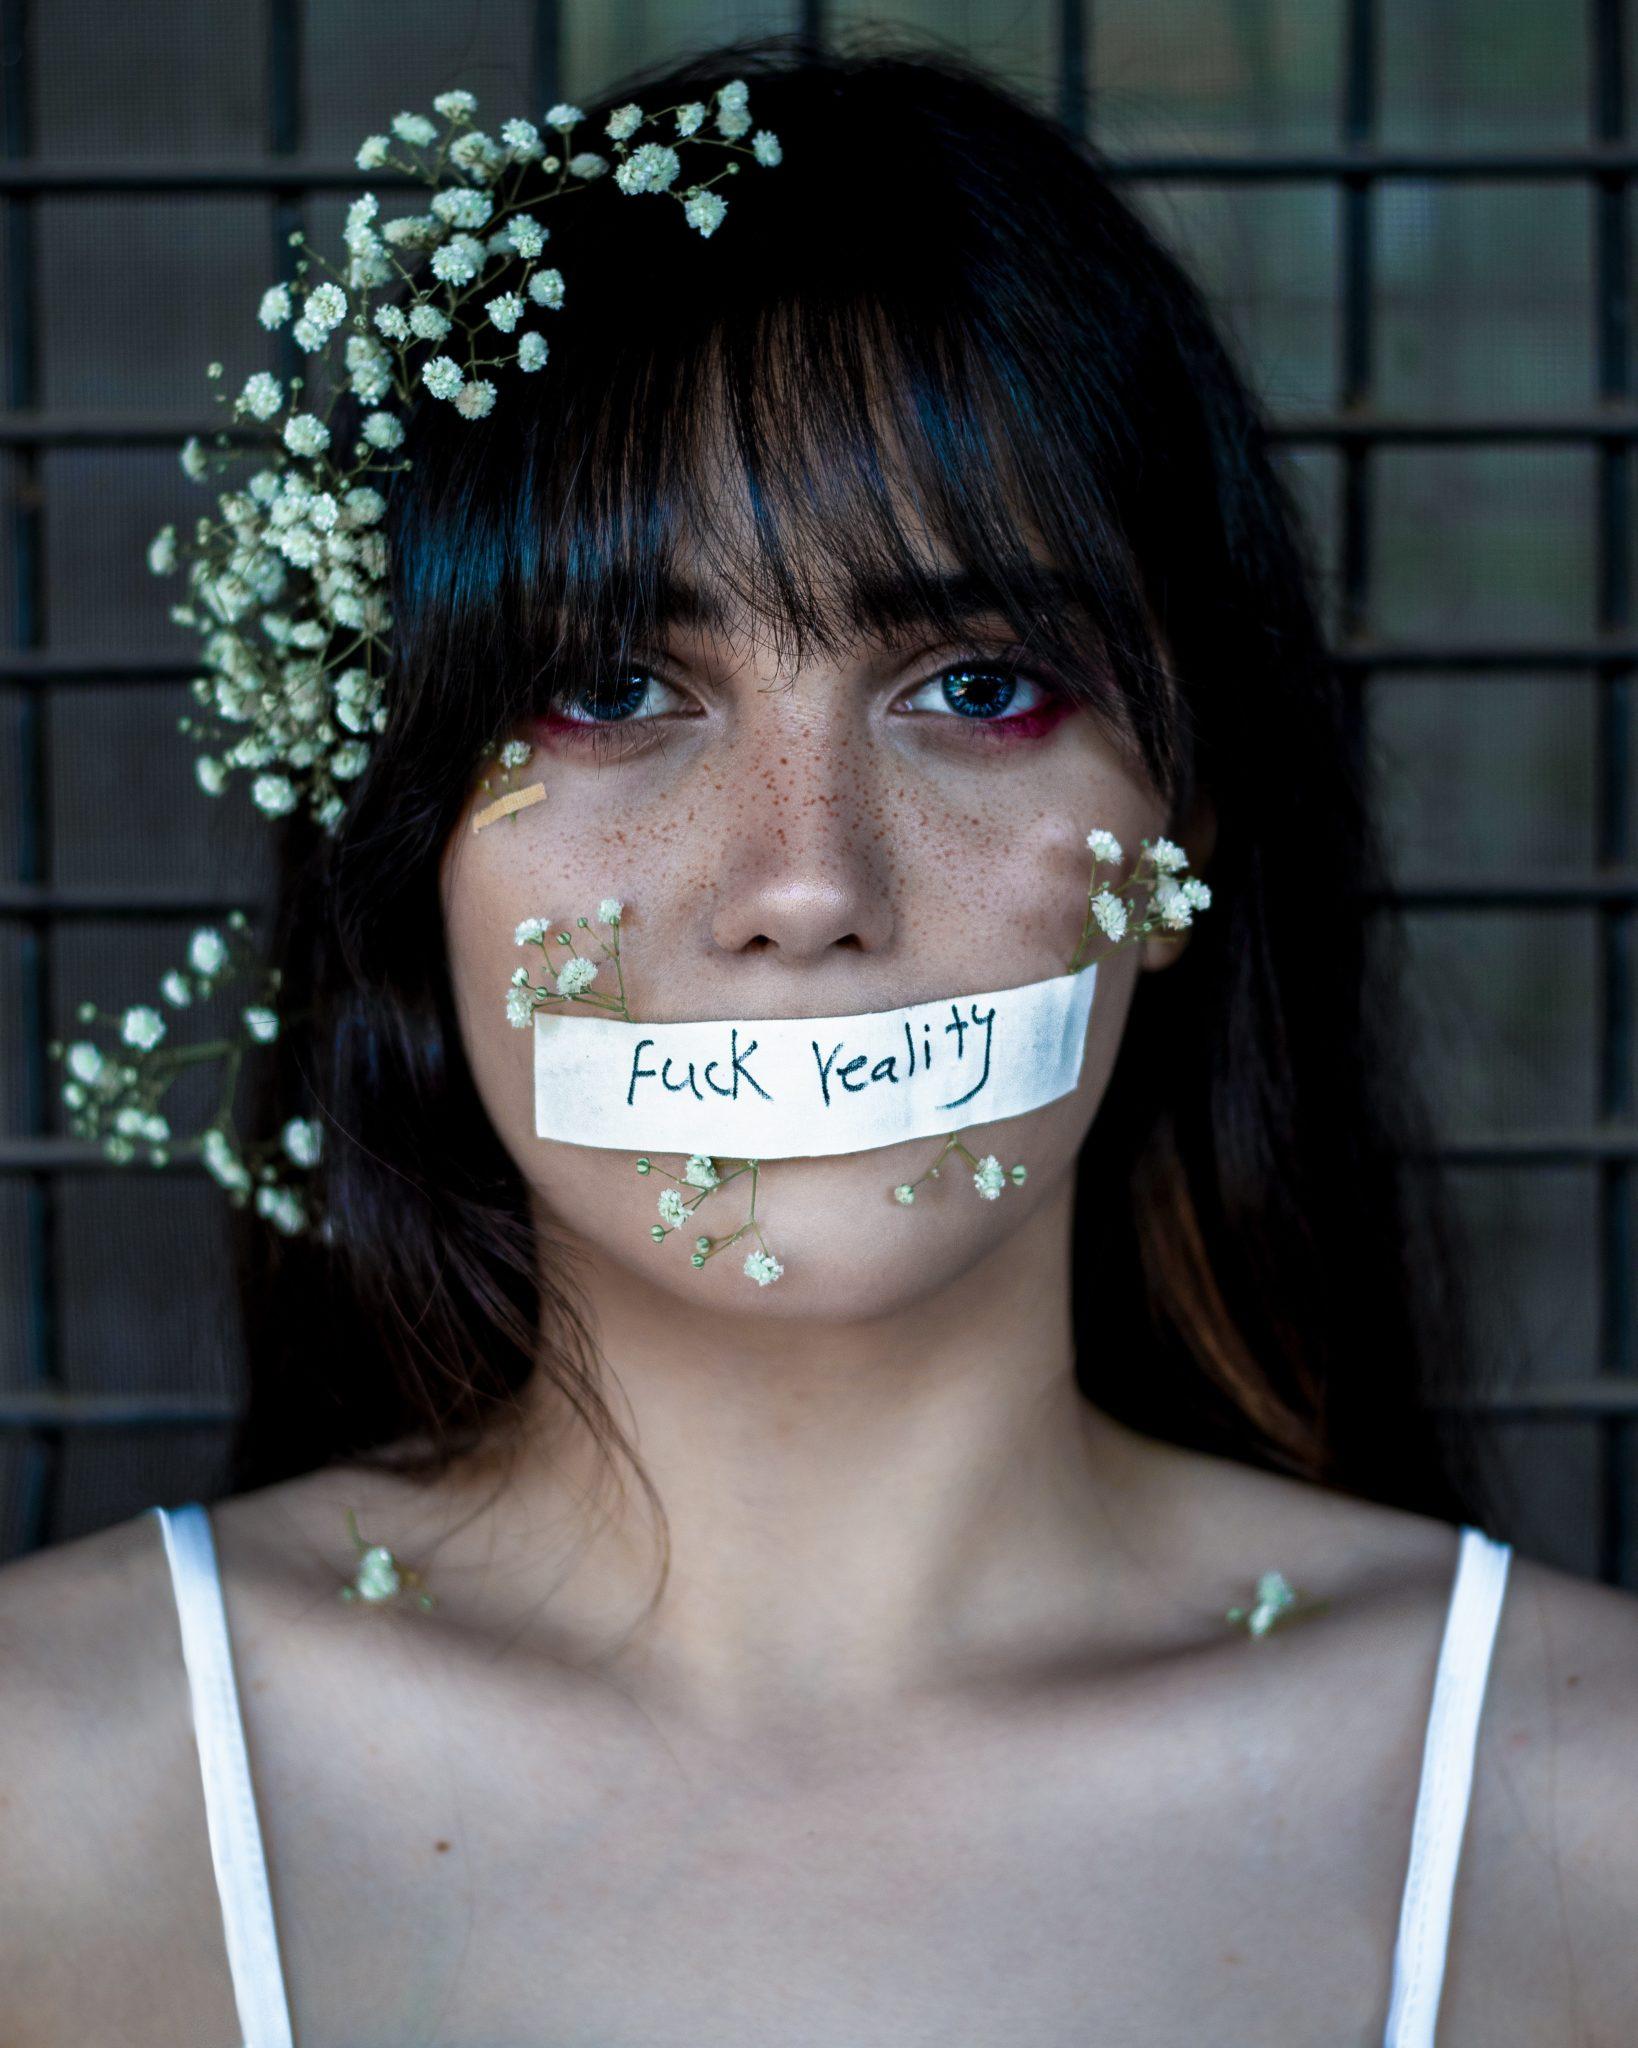 silenzio, indecisione, ansia, paura